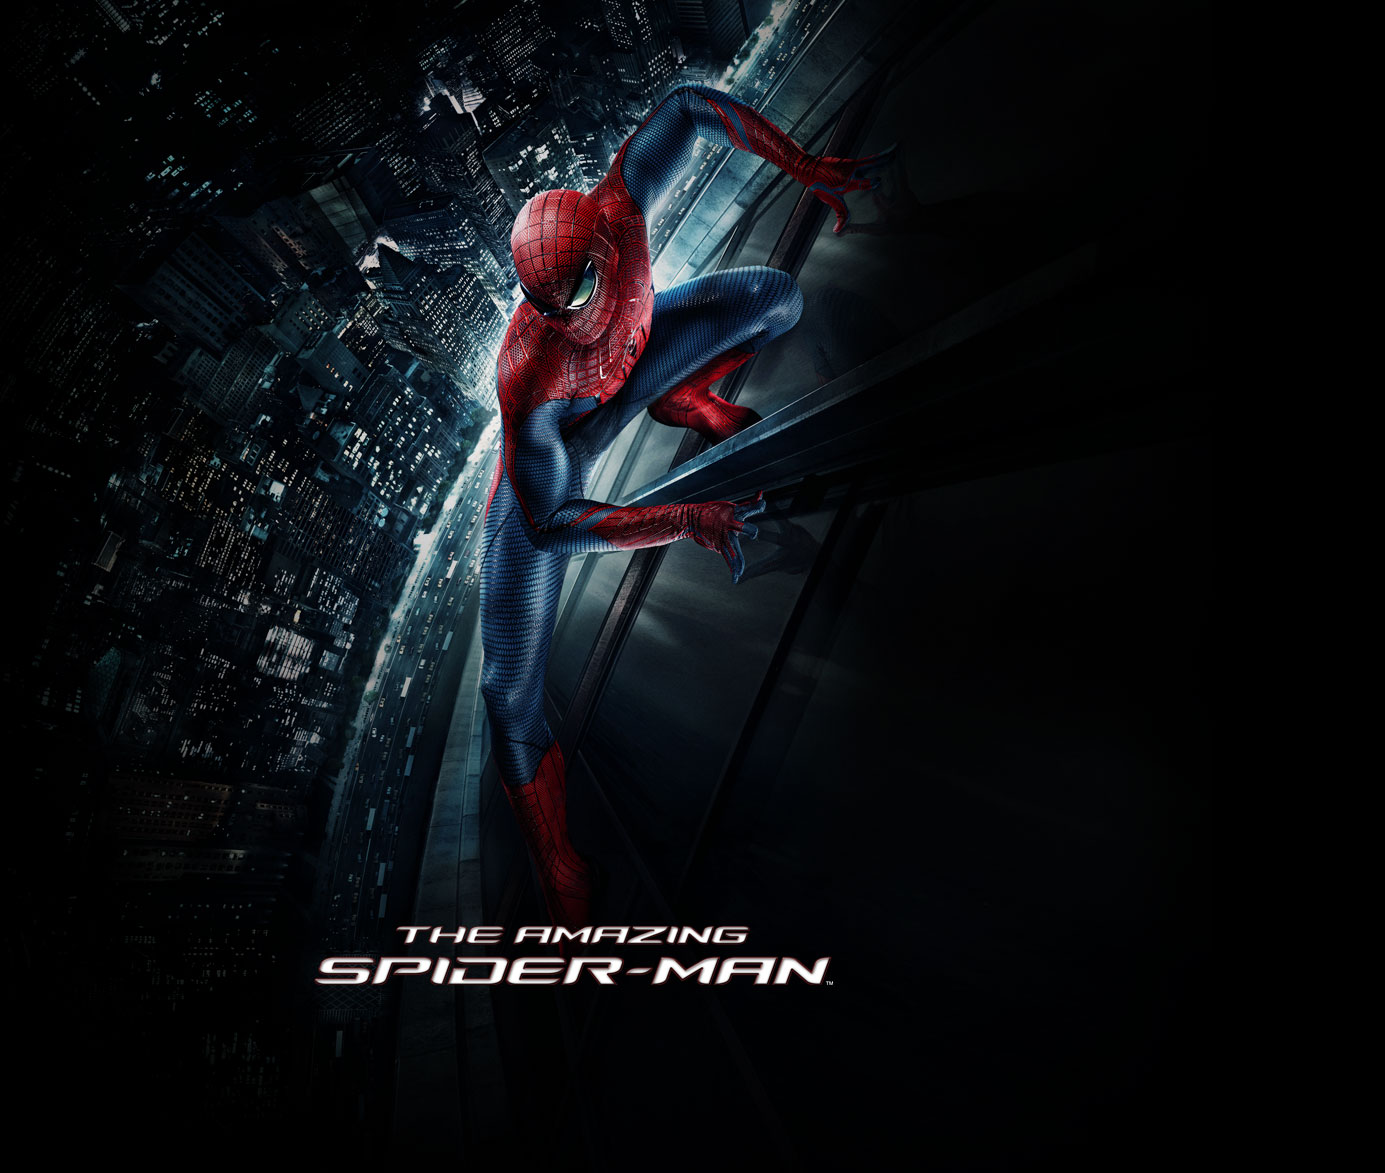 http://1.bp.blogspot.com/-BmC1Q3uMoA8/T_ivO62obnI/AAAAAAAABm0/5LTBBAQNBR4/s1600/The+Amazing+Spider-man+Wallpaper.jpg